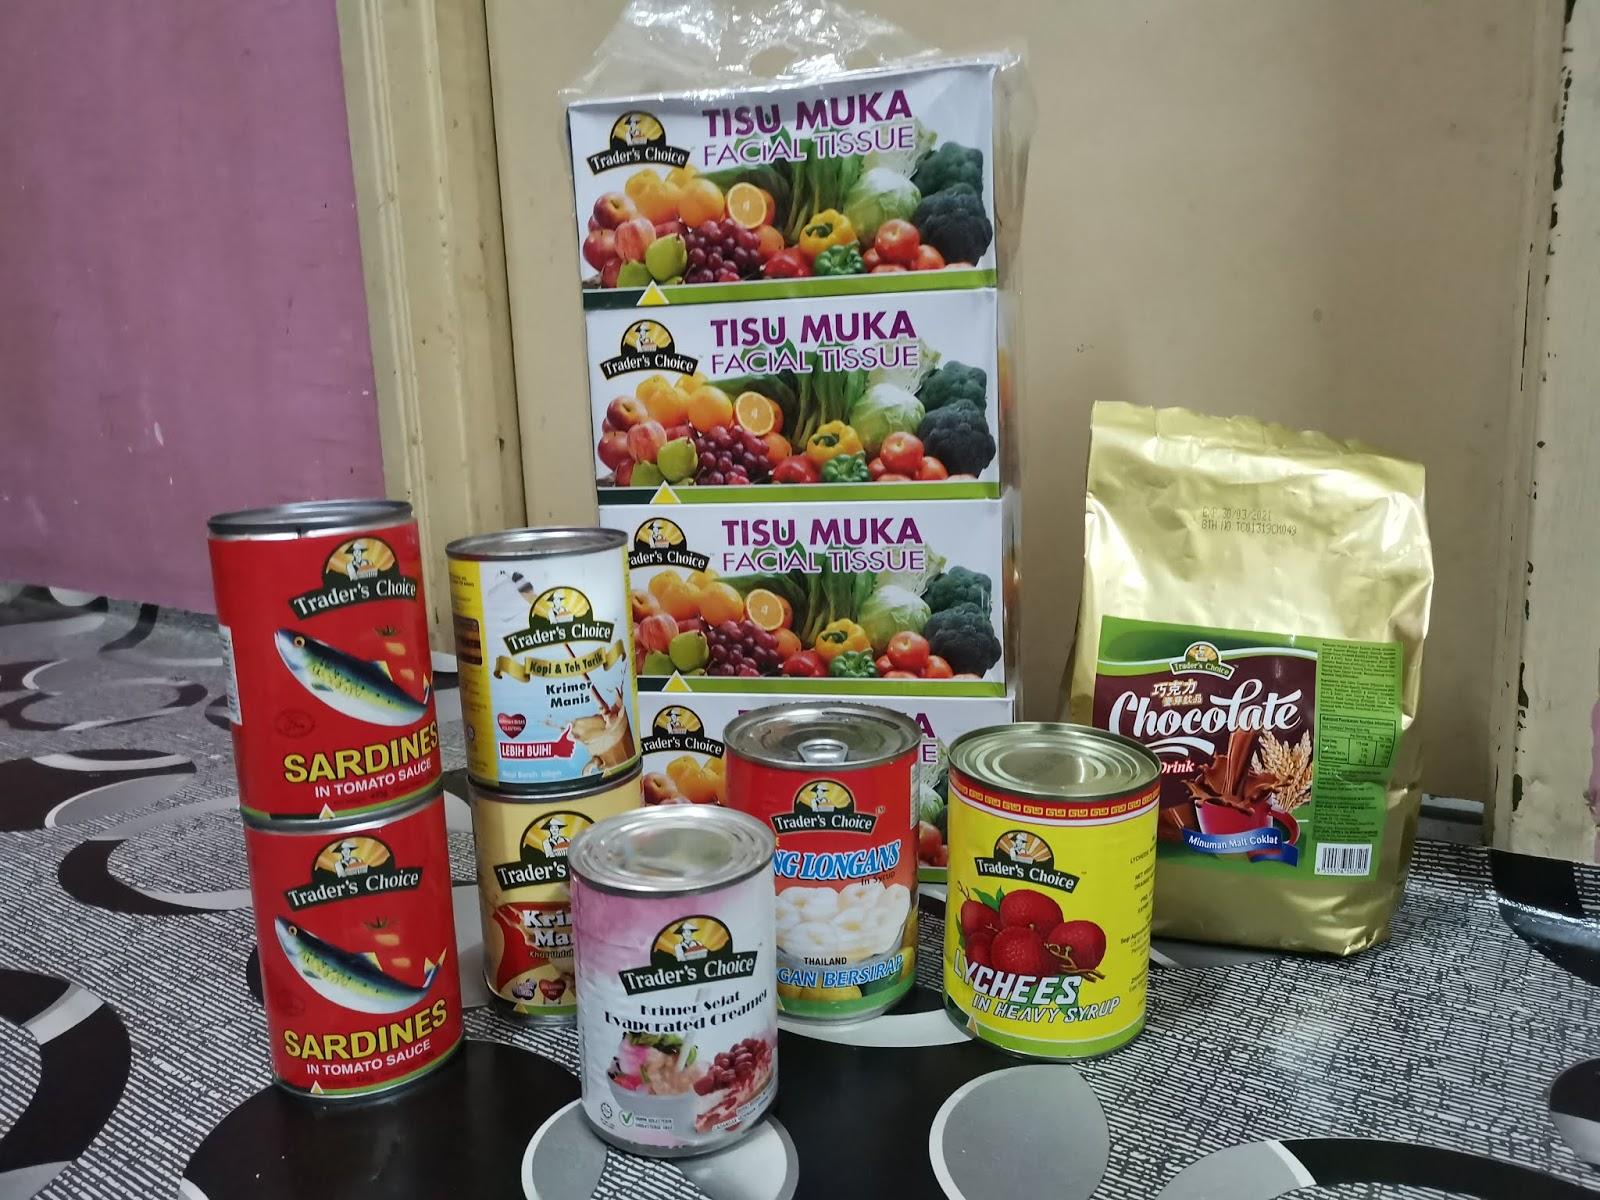 Segi Fresh Tawar Barangan Dapur Harga